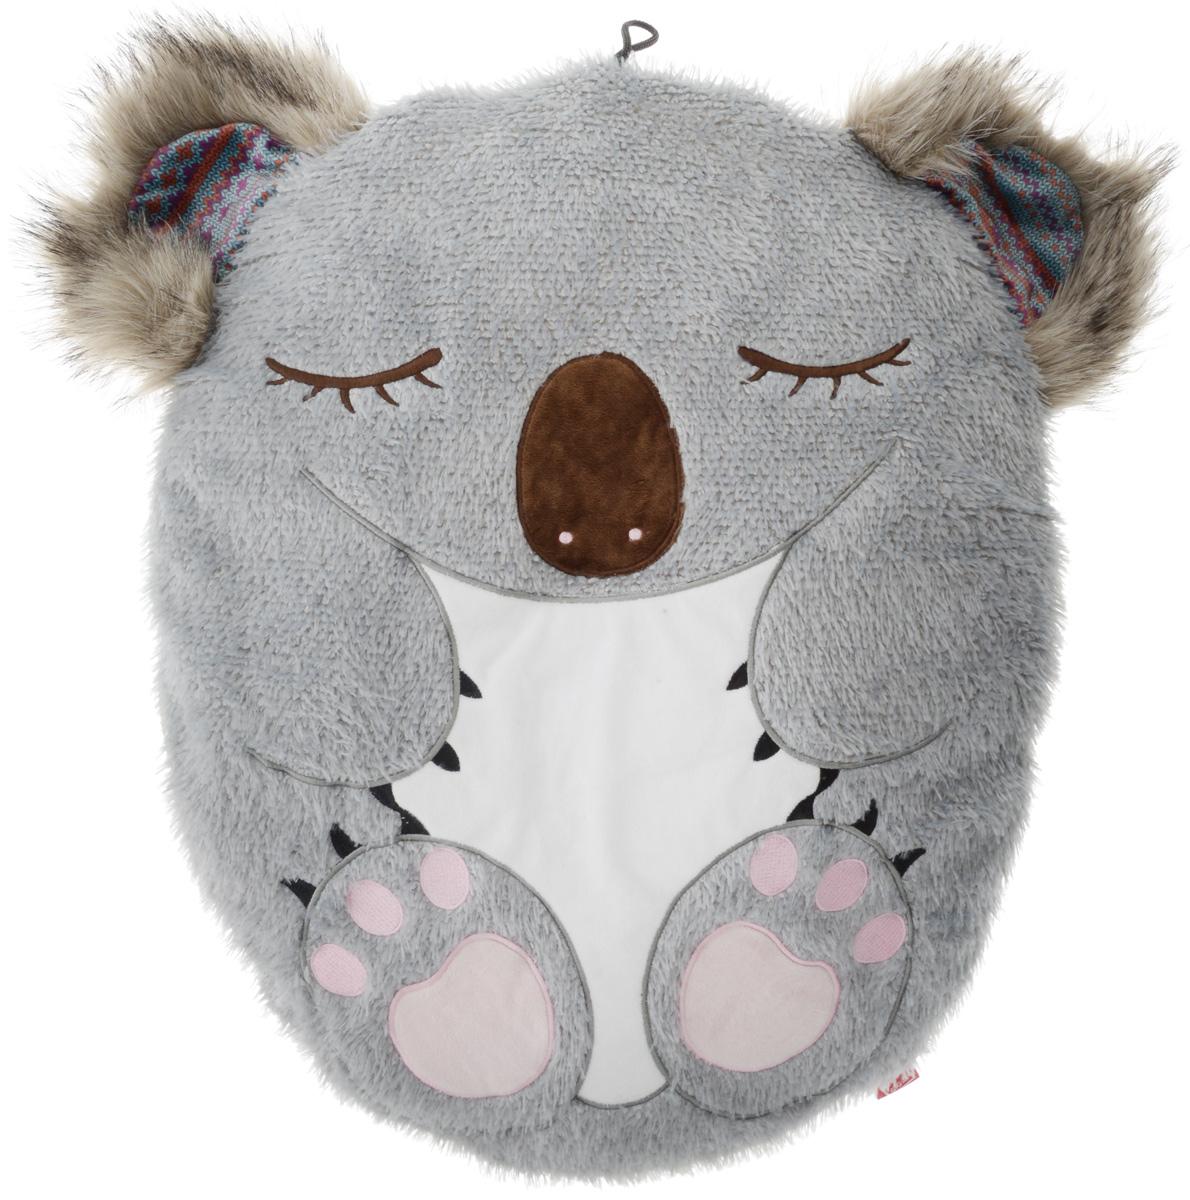 Лежак для собак GiGwi Коала, 53 х 45 х 6 см лежак дарэлл хантер лось 1 с подушкой 45 33 14см